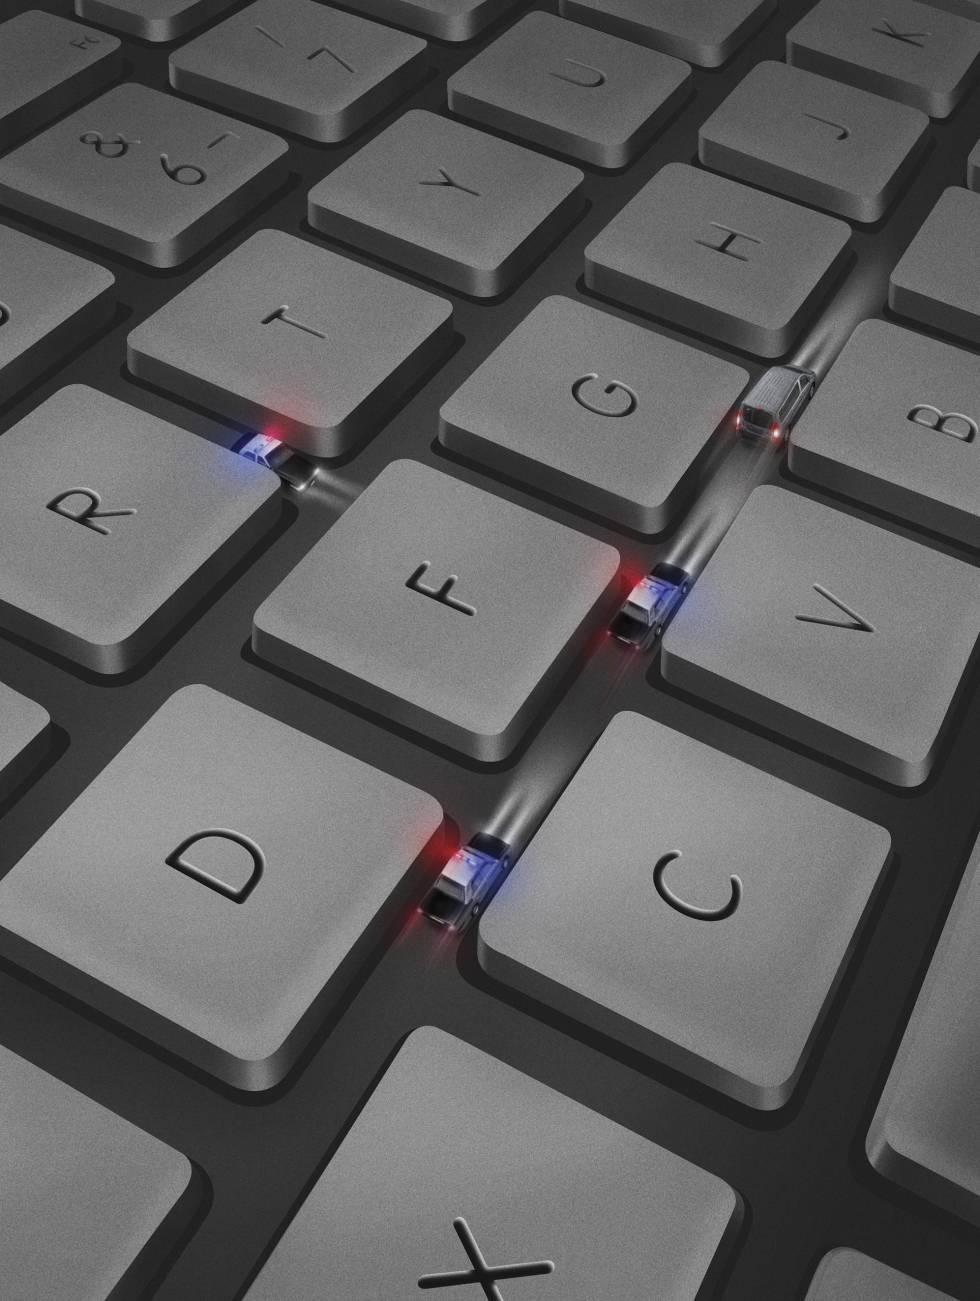 Cibercrimen. Ciberguerra. Ciberespionaje. Nadie está a salvo en Internet